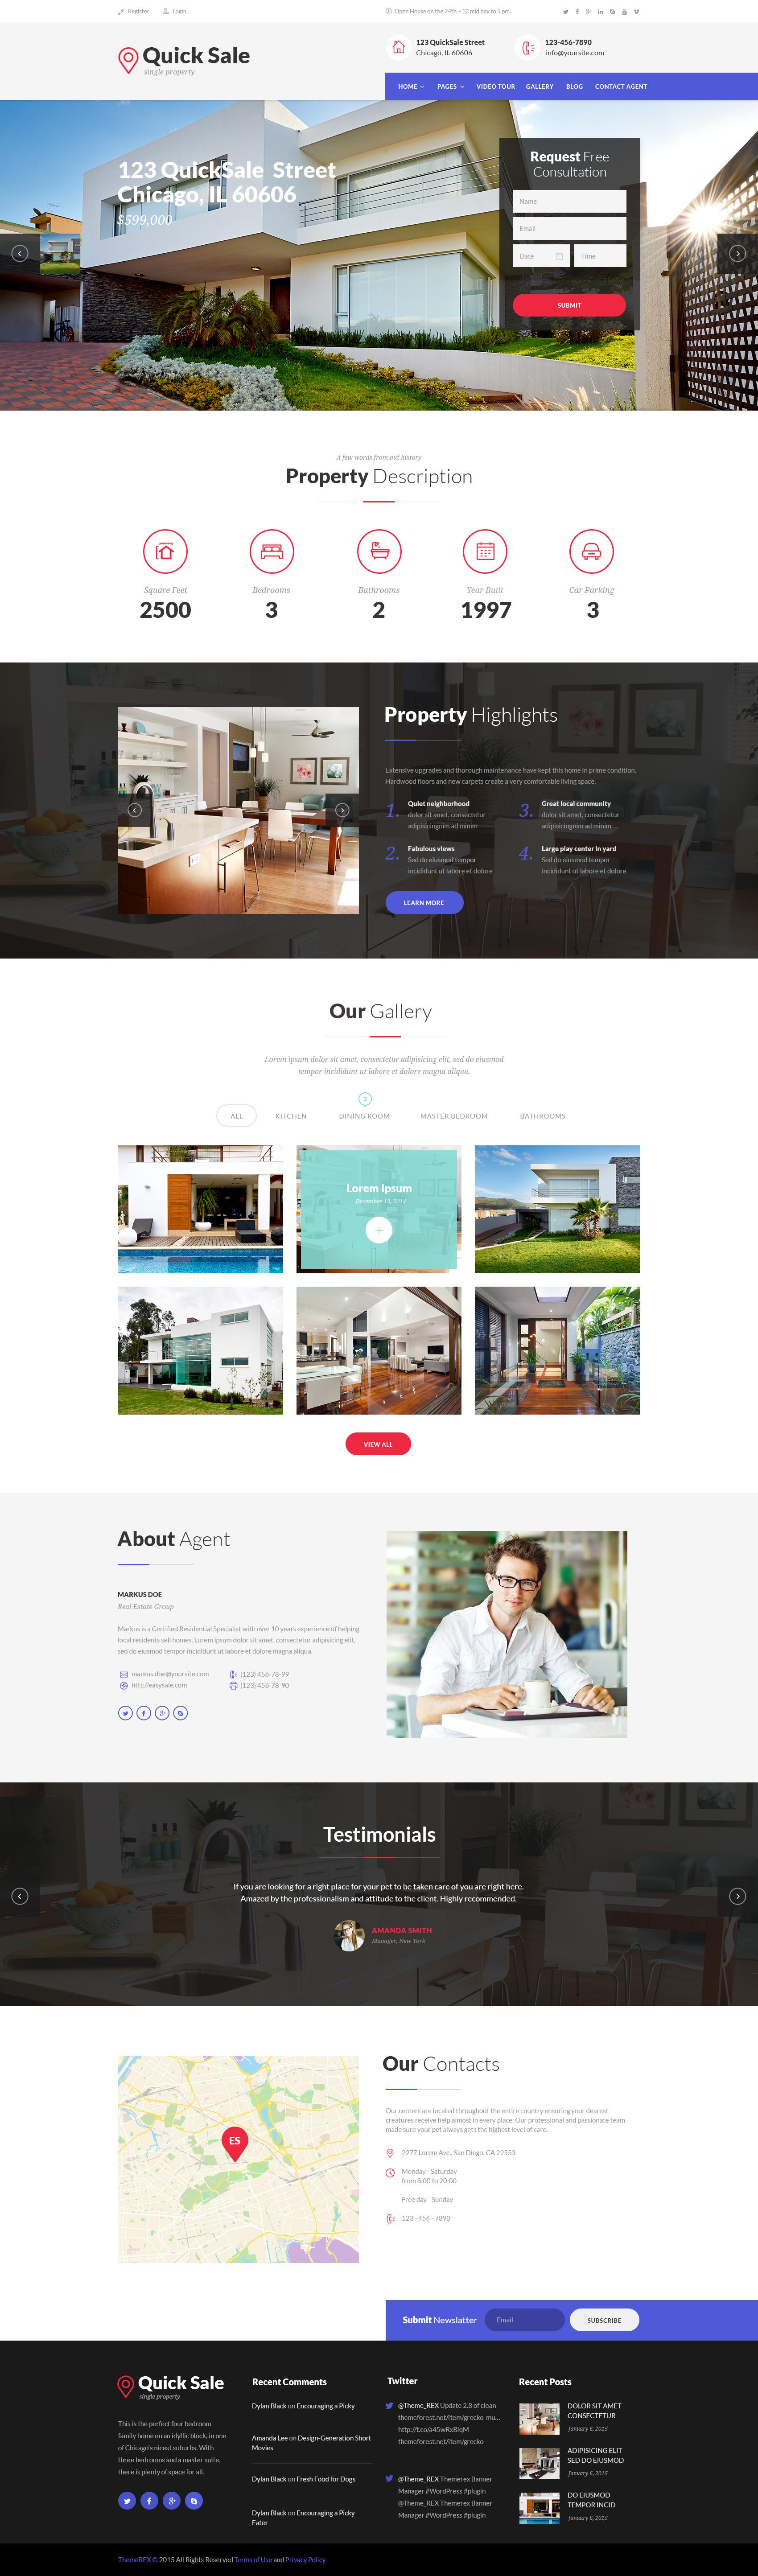 Quick Sale Single Property Real Estate Wordpress Theme By Themerex